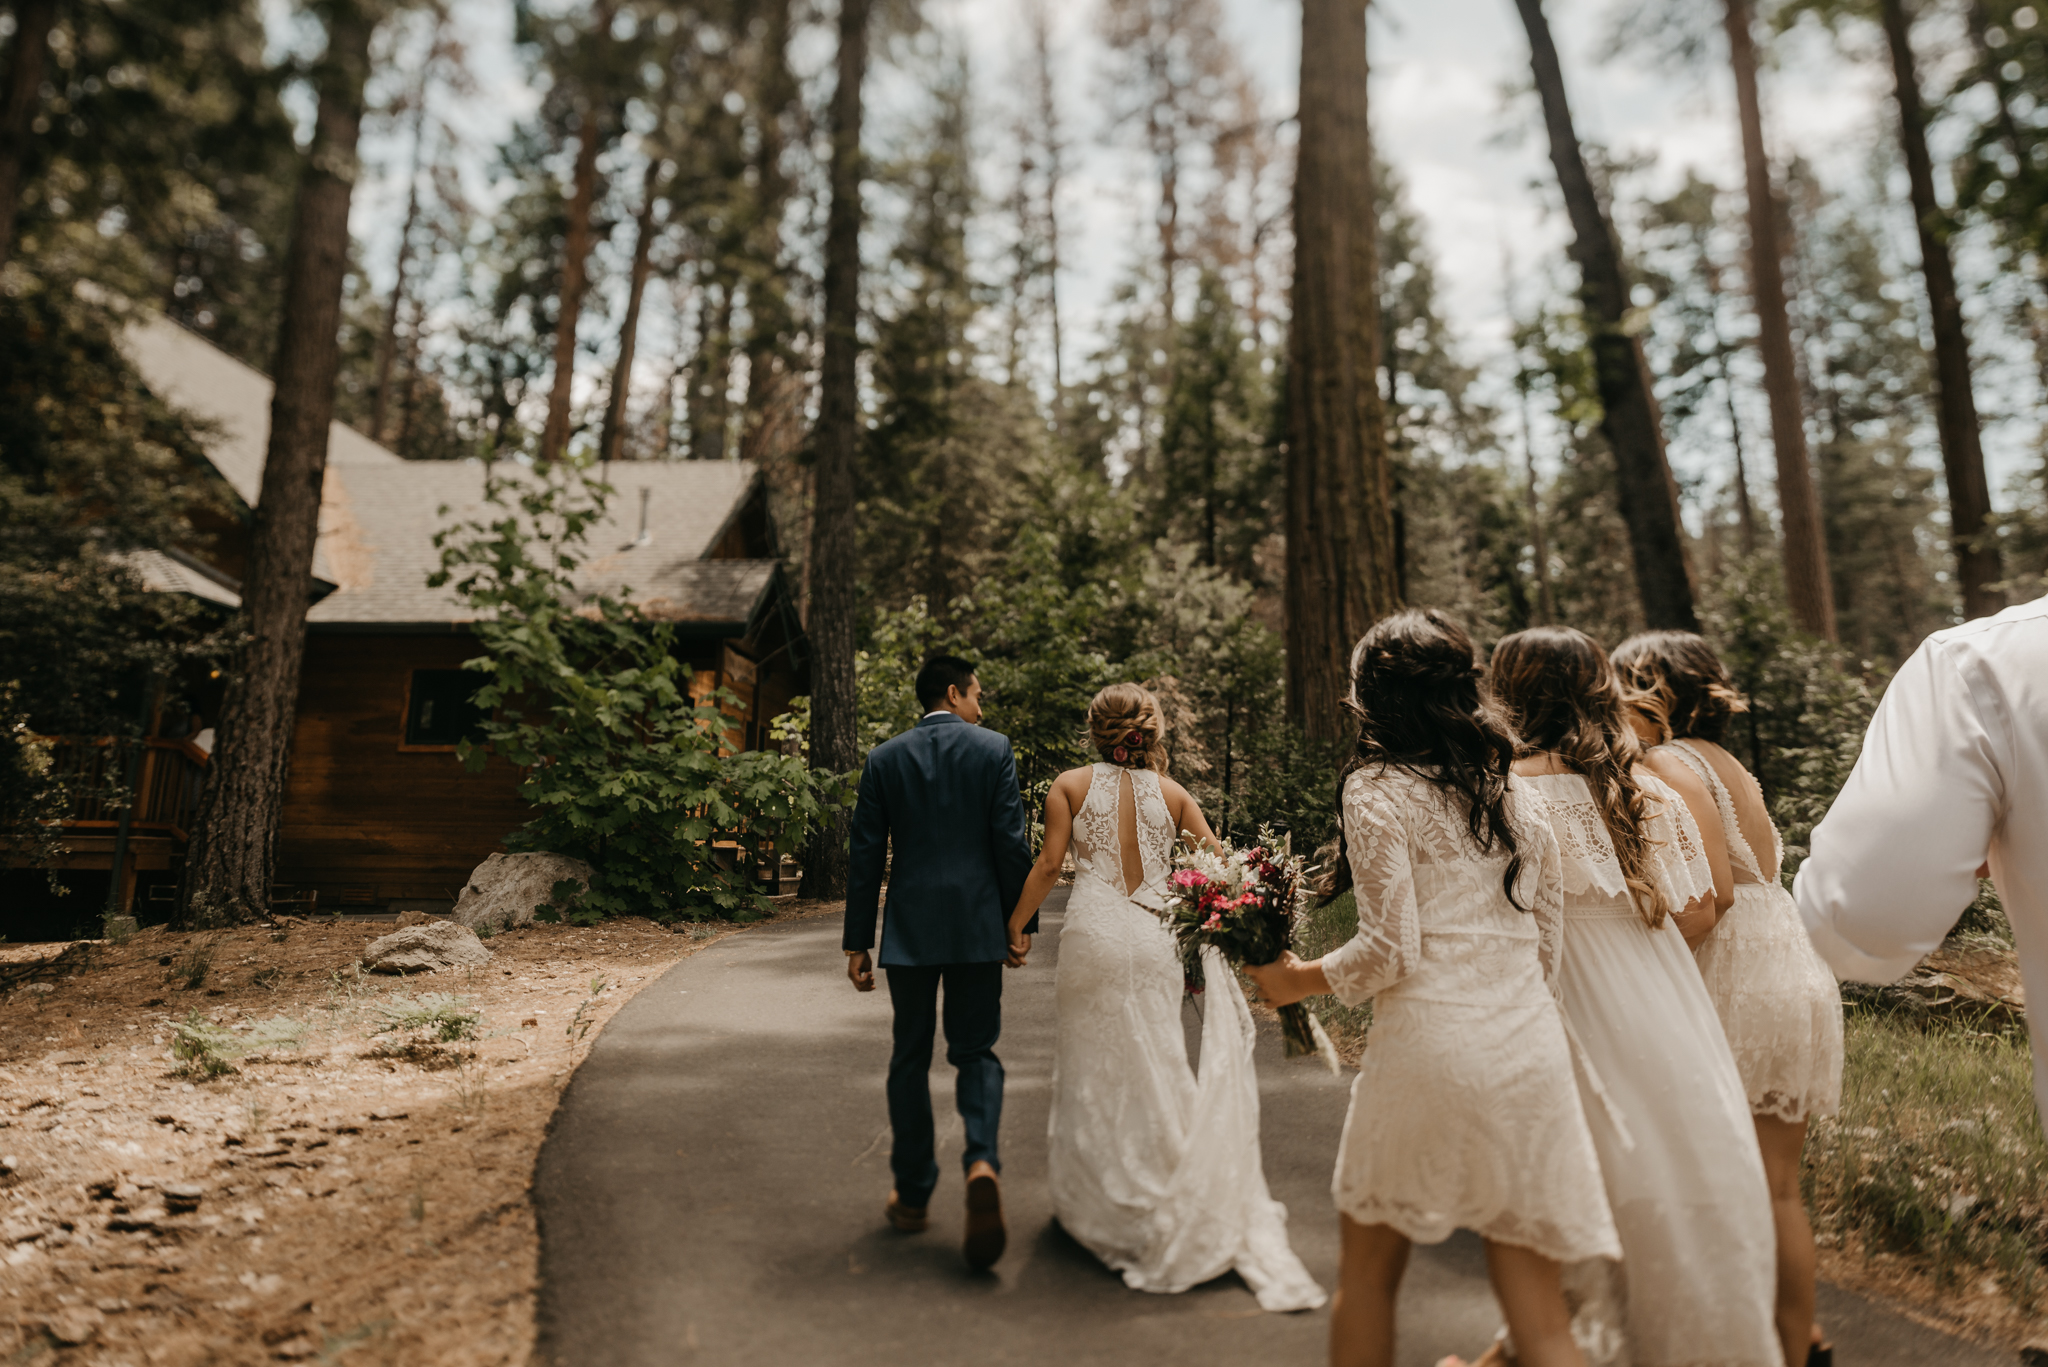 © Isaiah + Taylor Photography - Evergreen Lodge Destination Yoesmite Wedding - Los Angeles Wedding Photographer-095.jpg